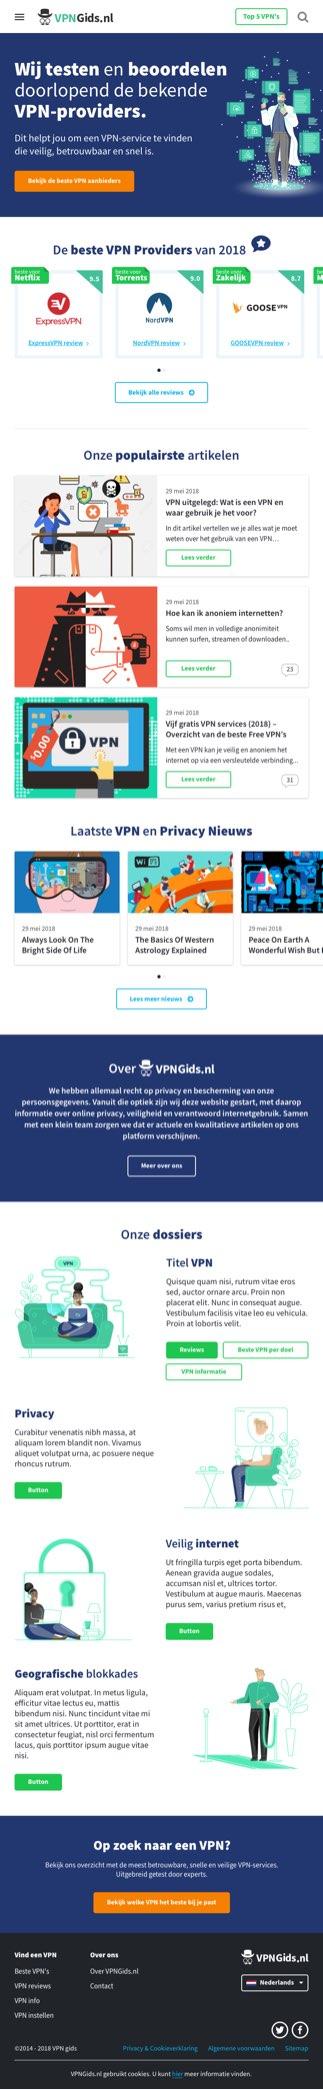 VPNGids.nl Responsive Tablet